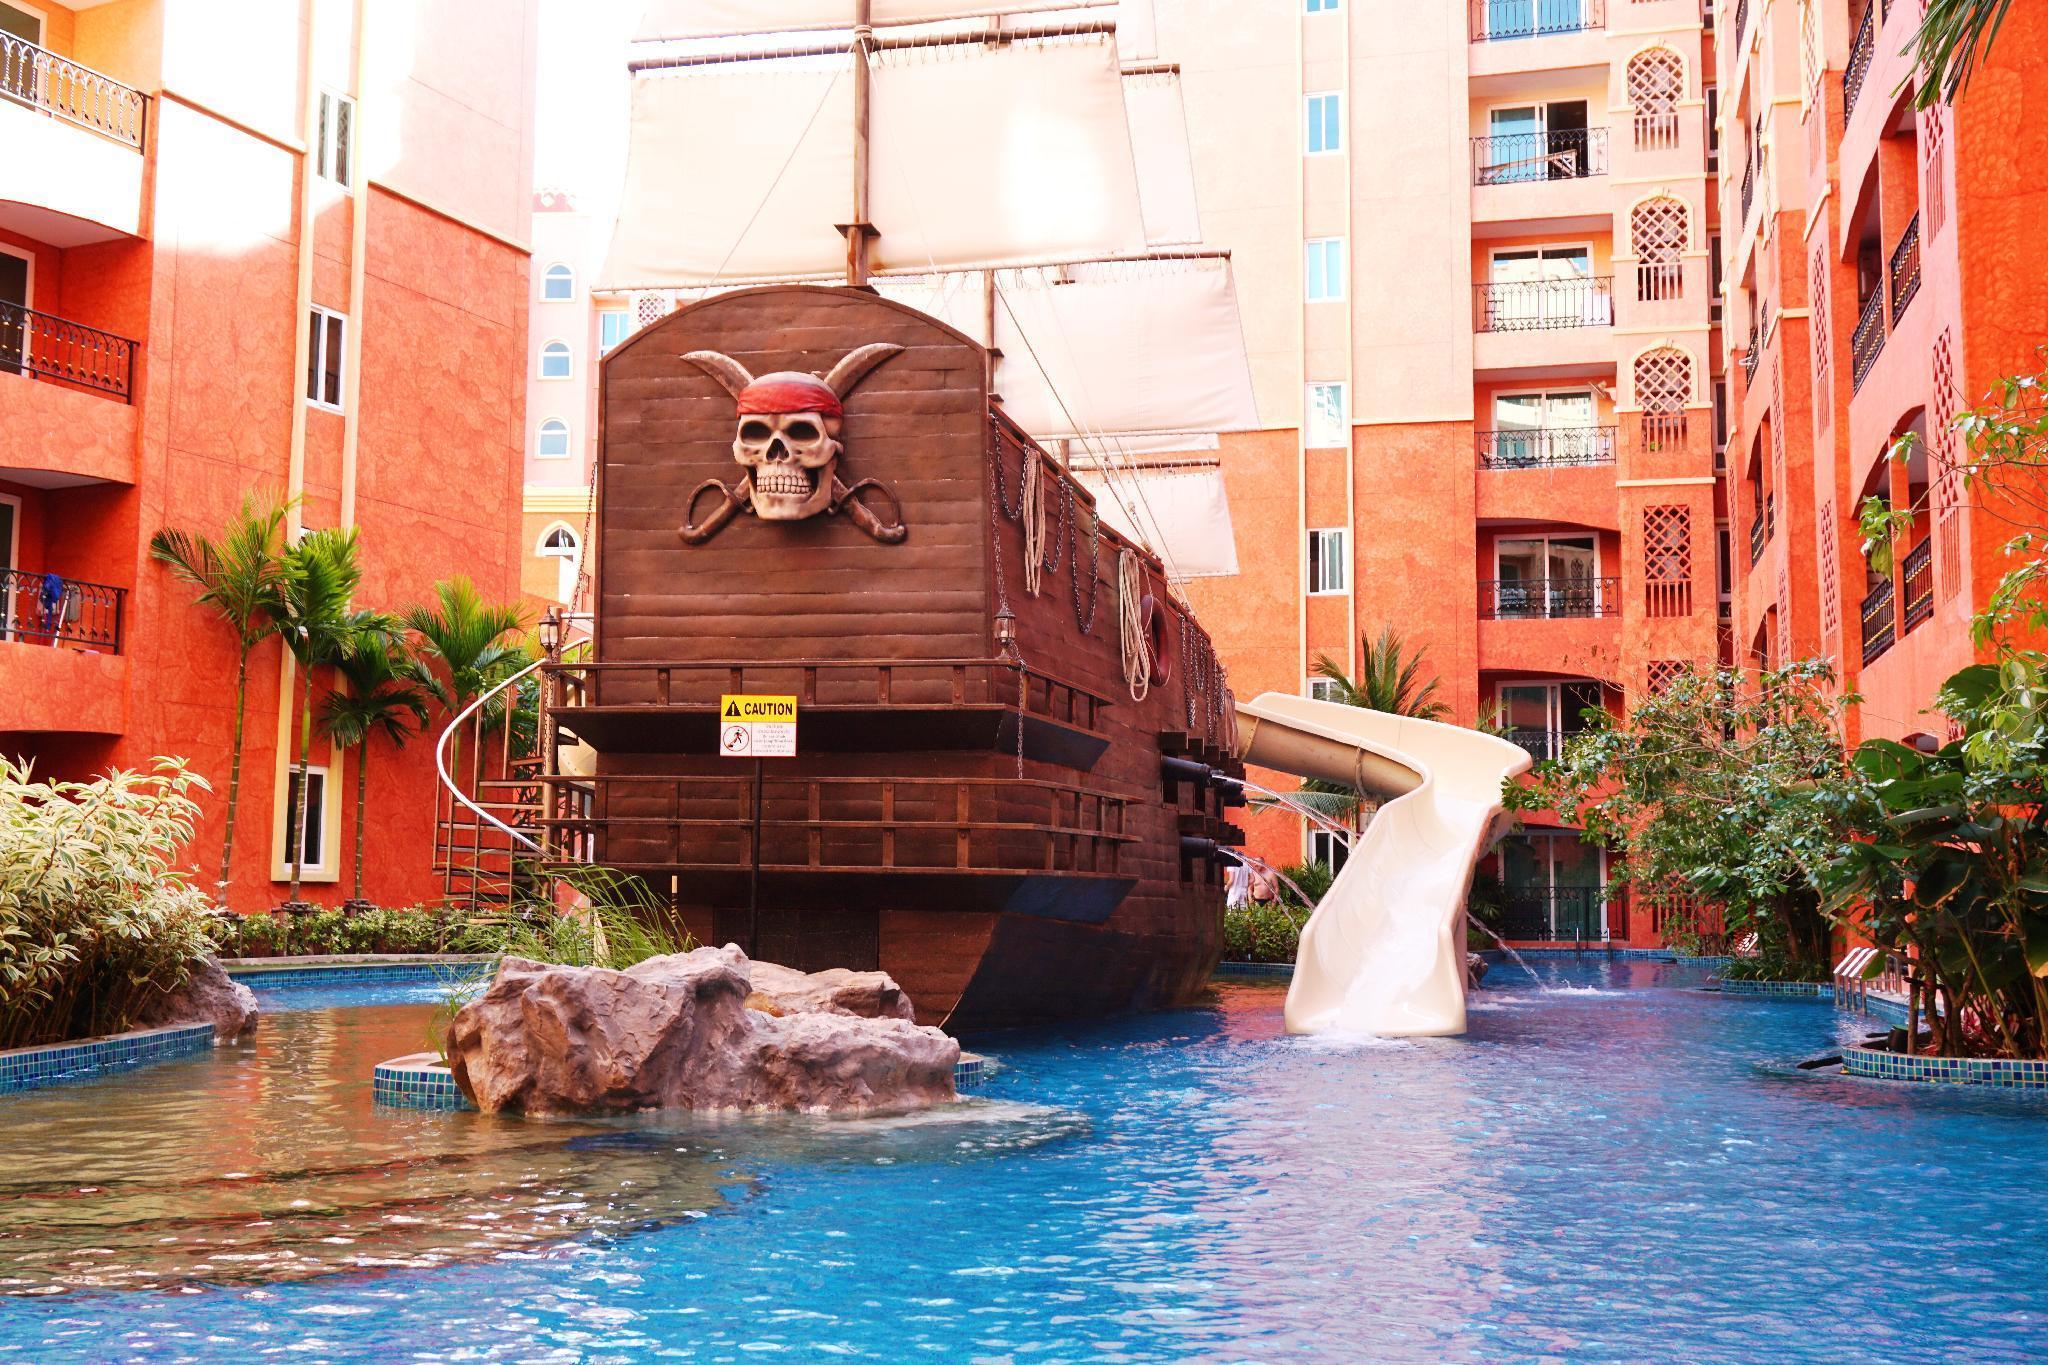 Seven Sea Resort Pattaya By Nithit2 อพาร์ตเมนต์ 1 ห้องนอน 1 ห้องน้ำส่วนตัว ขนาด 37 ตร.ม. – หาดจอมเทียน